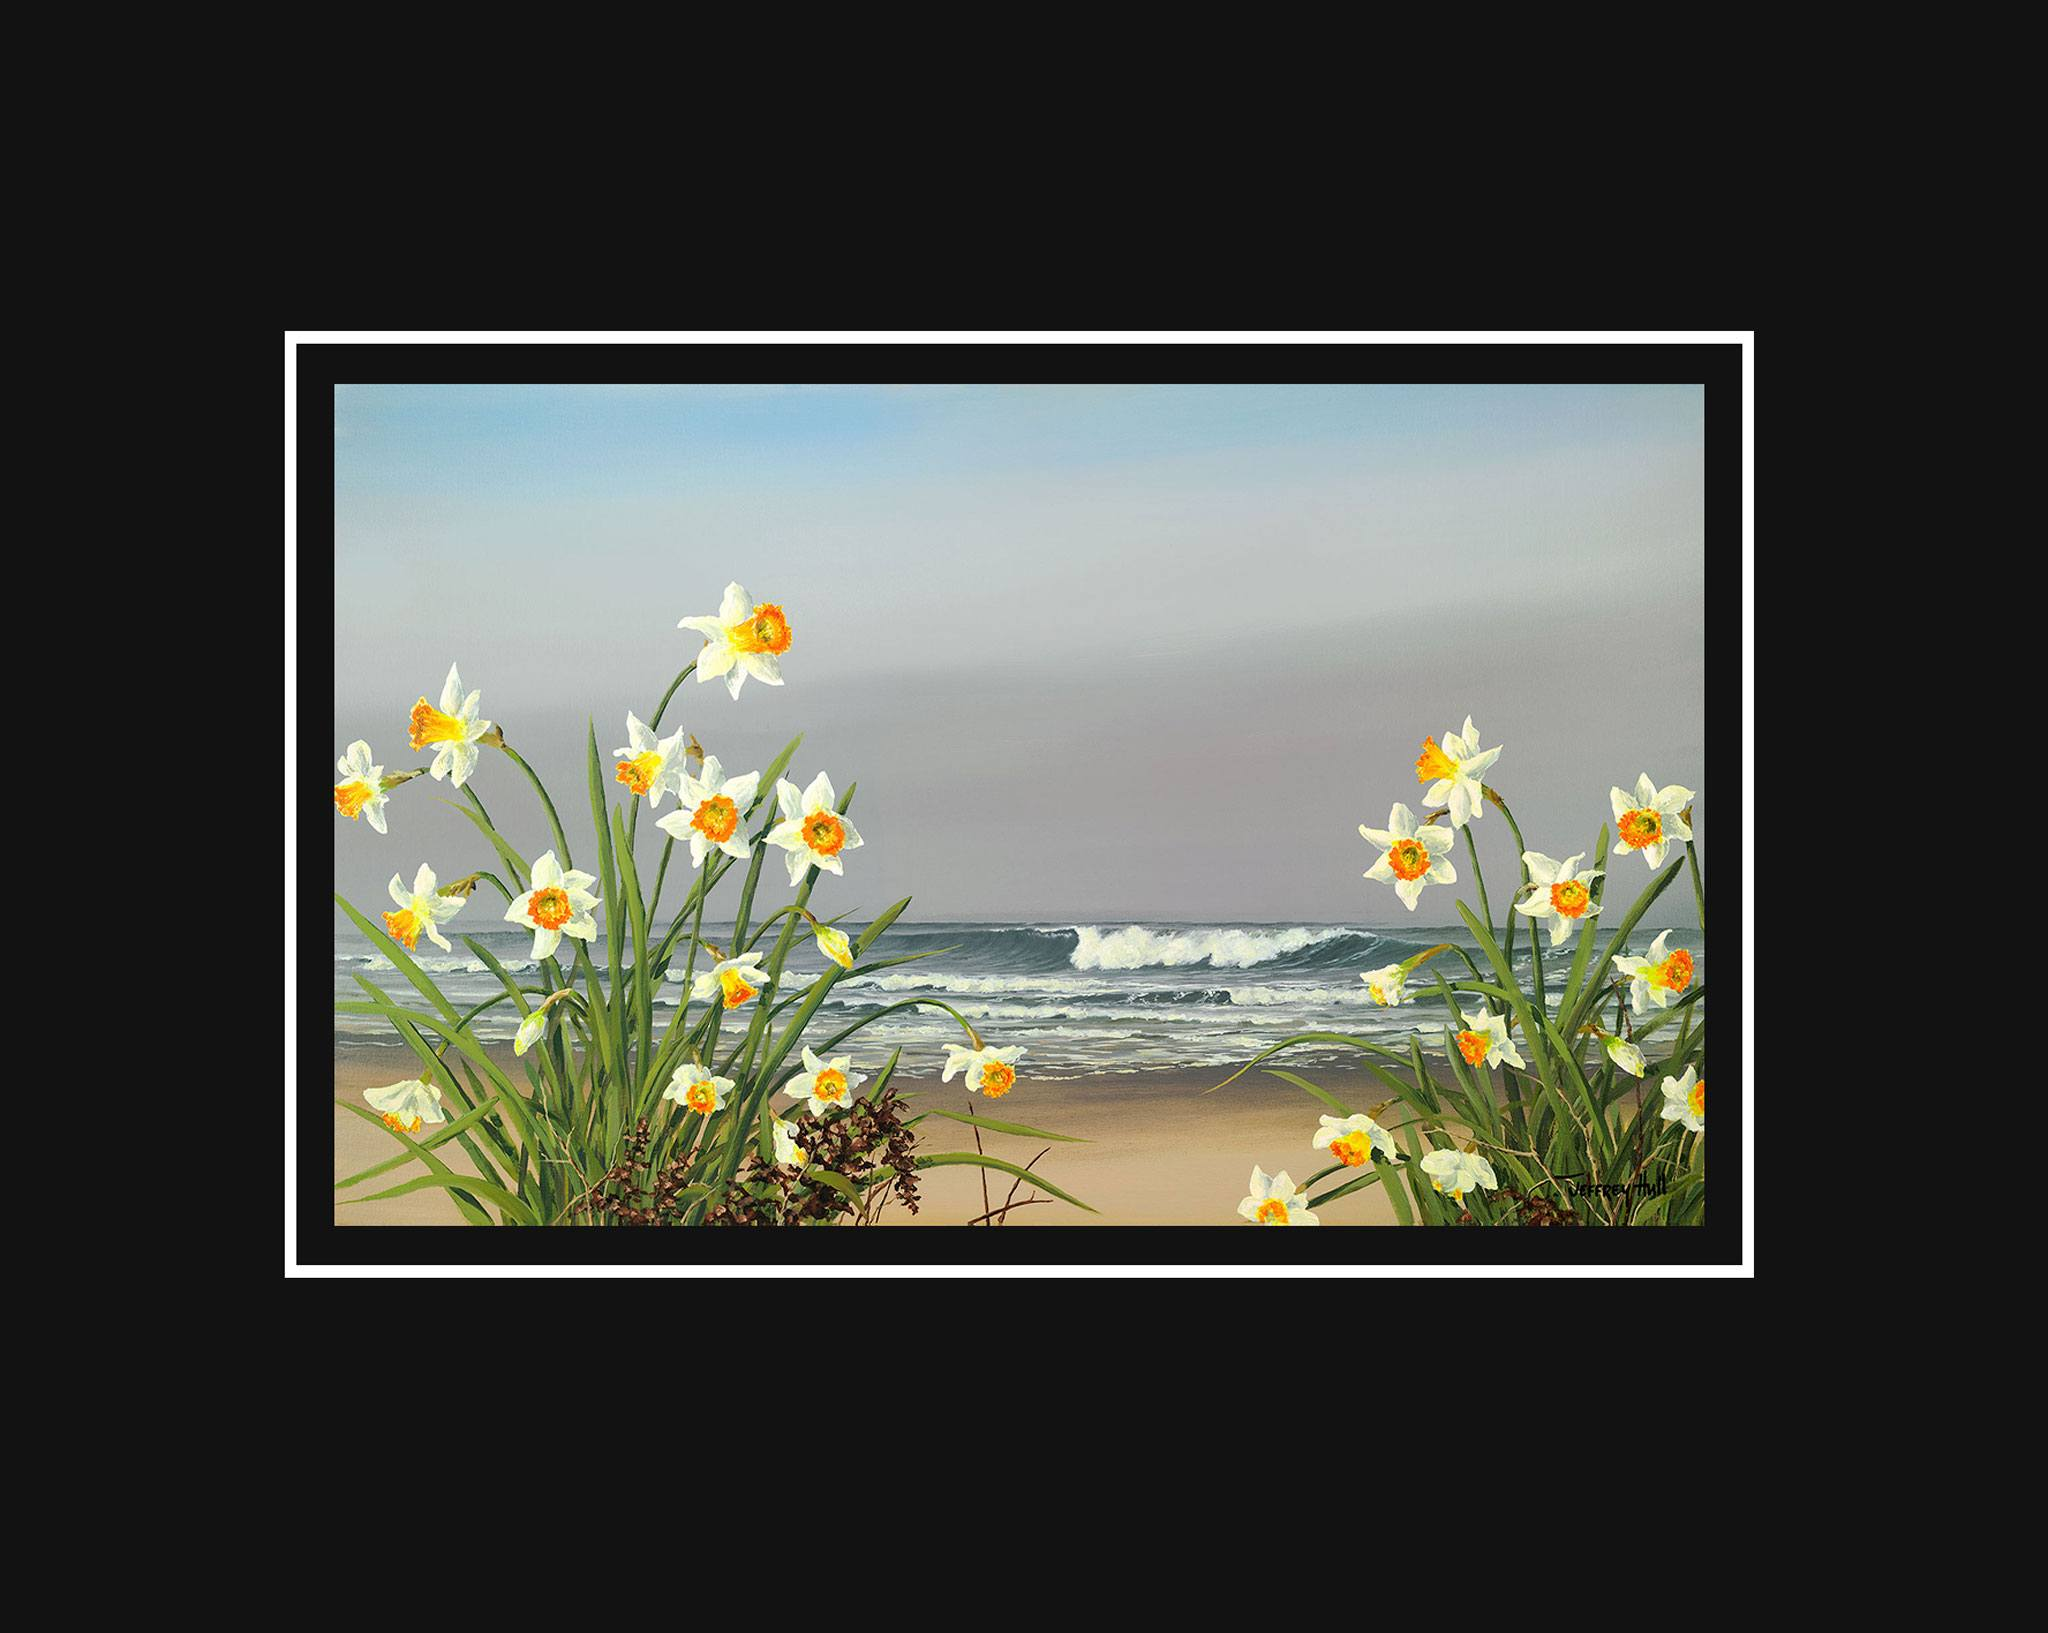 Shoreline-Daffodils-Mini-Unframed-Jet-Black-4-Website-2021